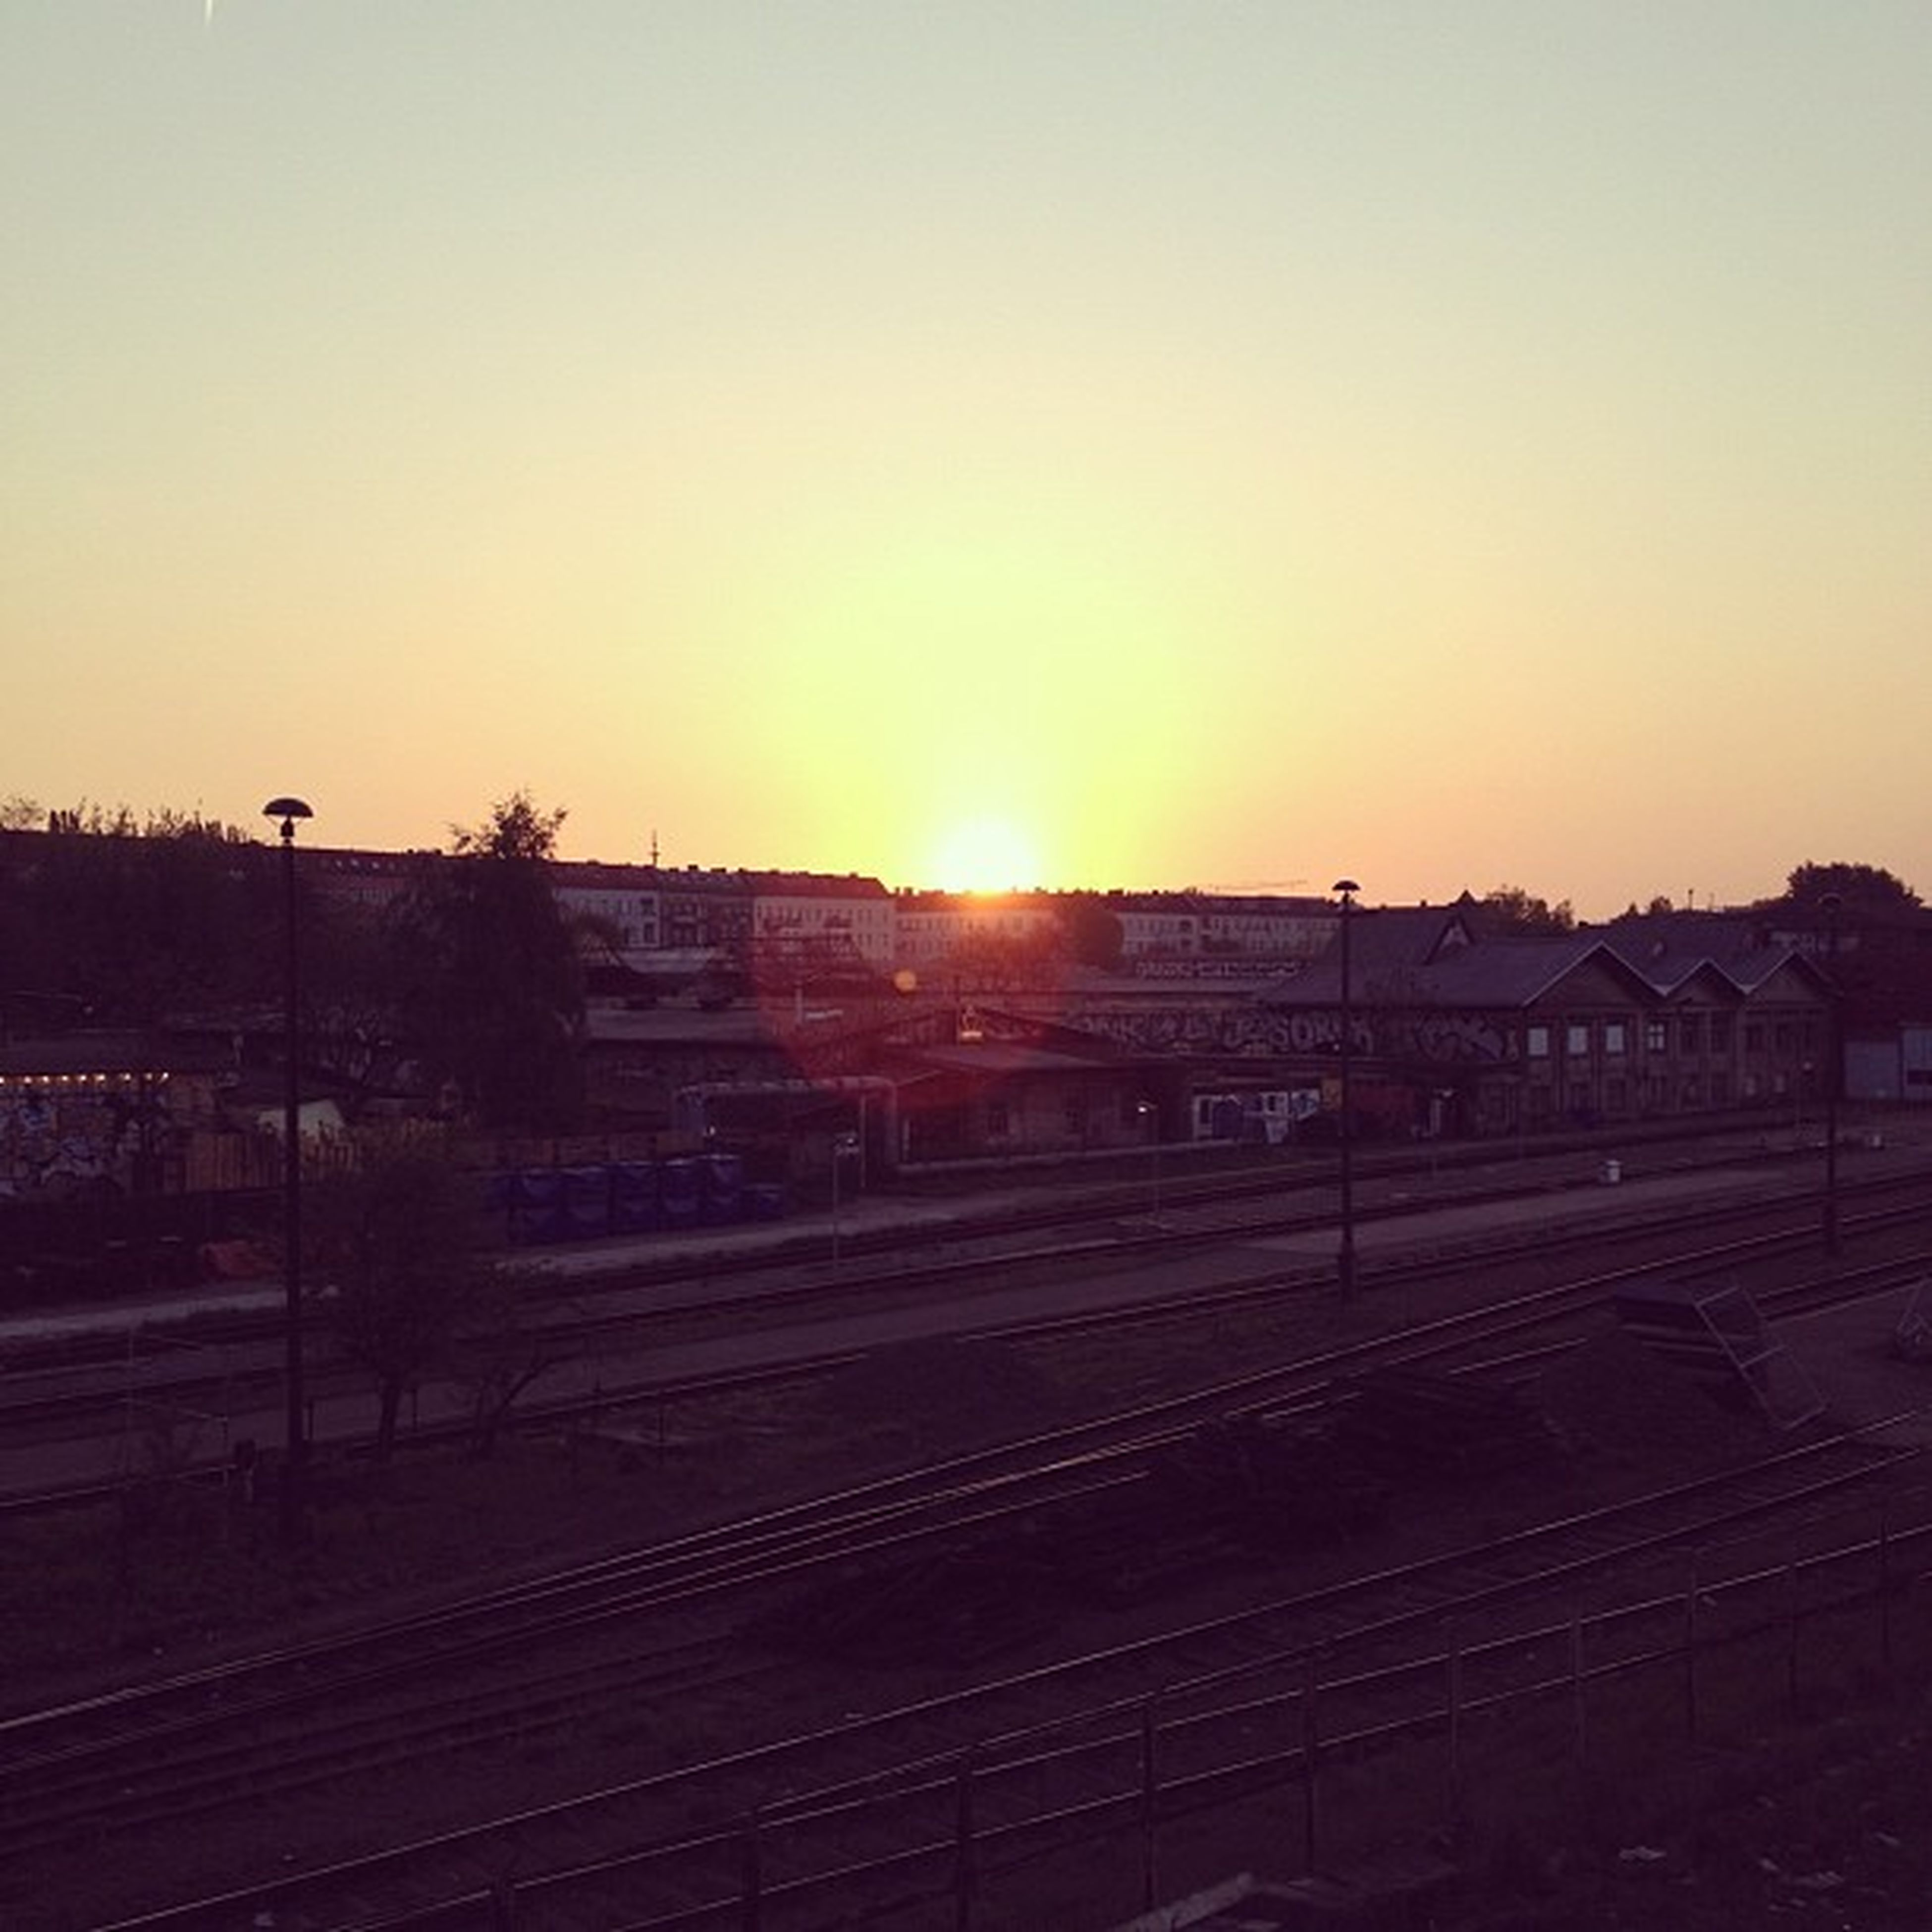 sunset, sun, clear sky, orange color, copy space, transportation, railroad track, sunlight, rail transportation, sky, silhouette, landscape, built structure, sunbeam, lens flare, nature, outdoors, building exterior, no people, road